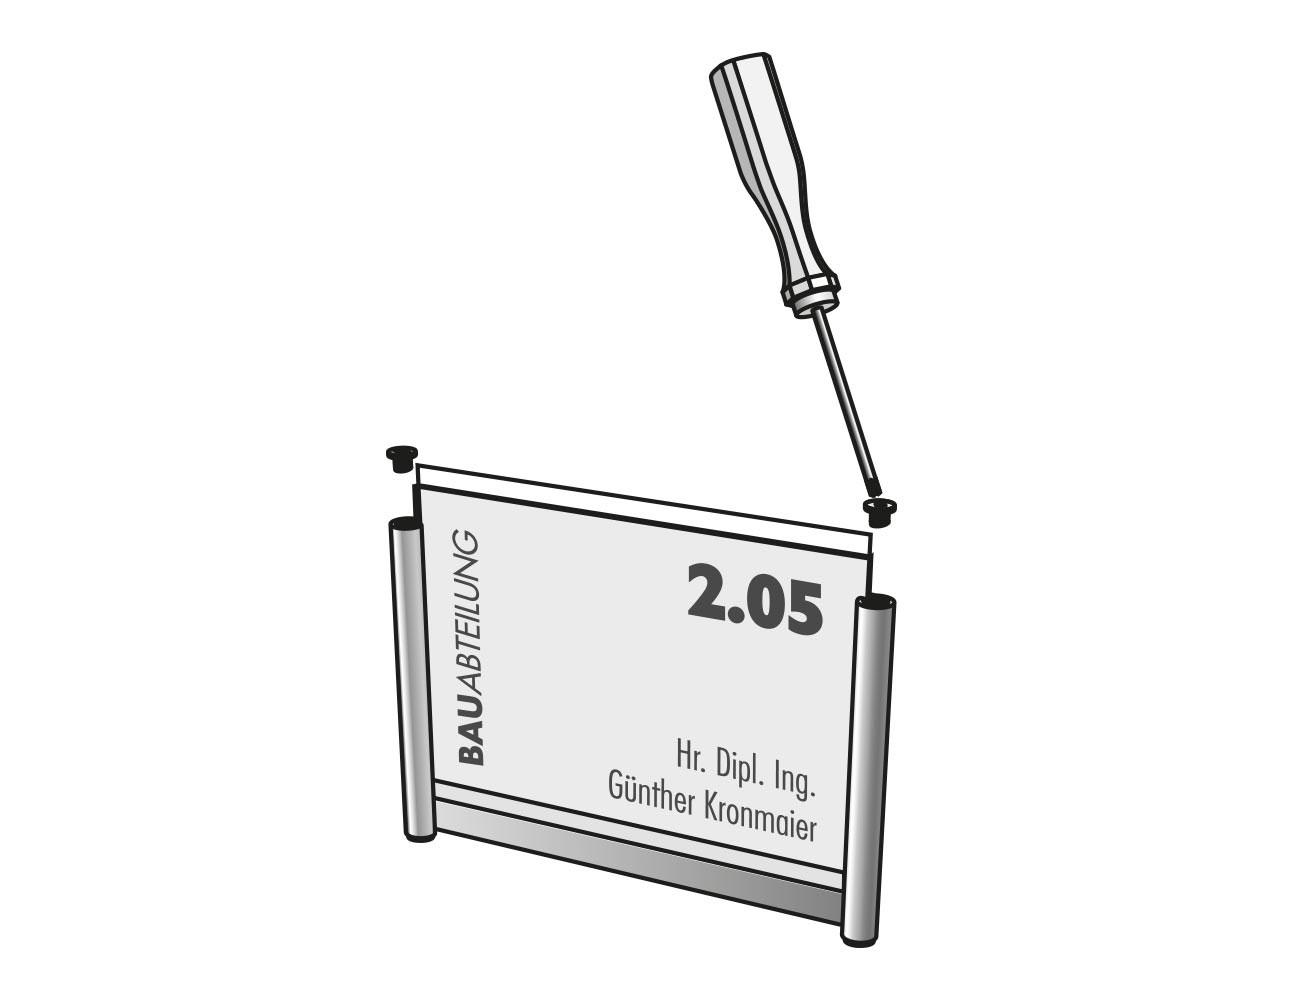 Türschild PLANO - Textwechsel